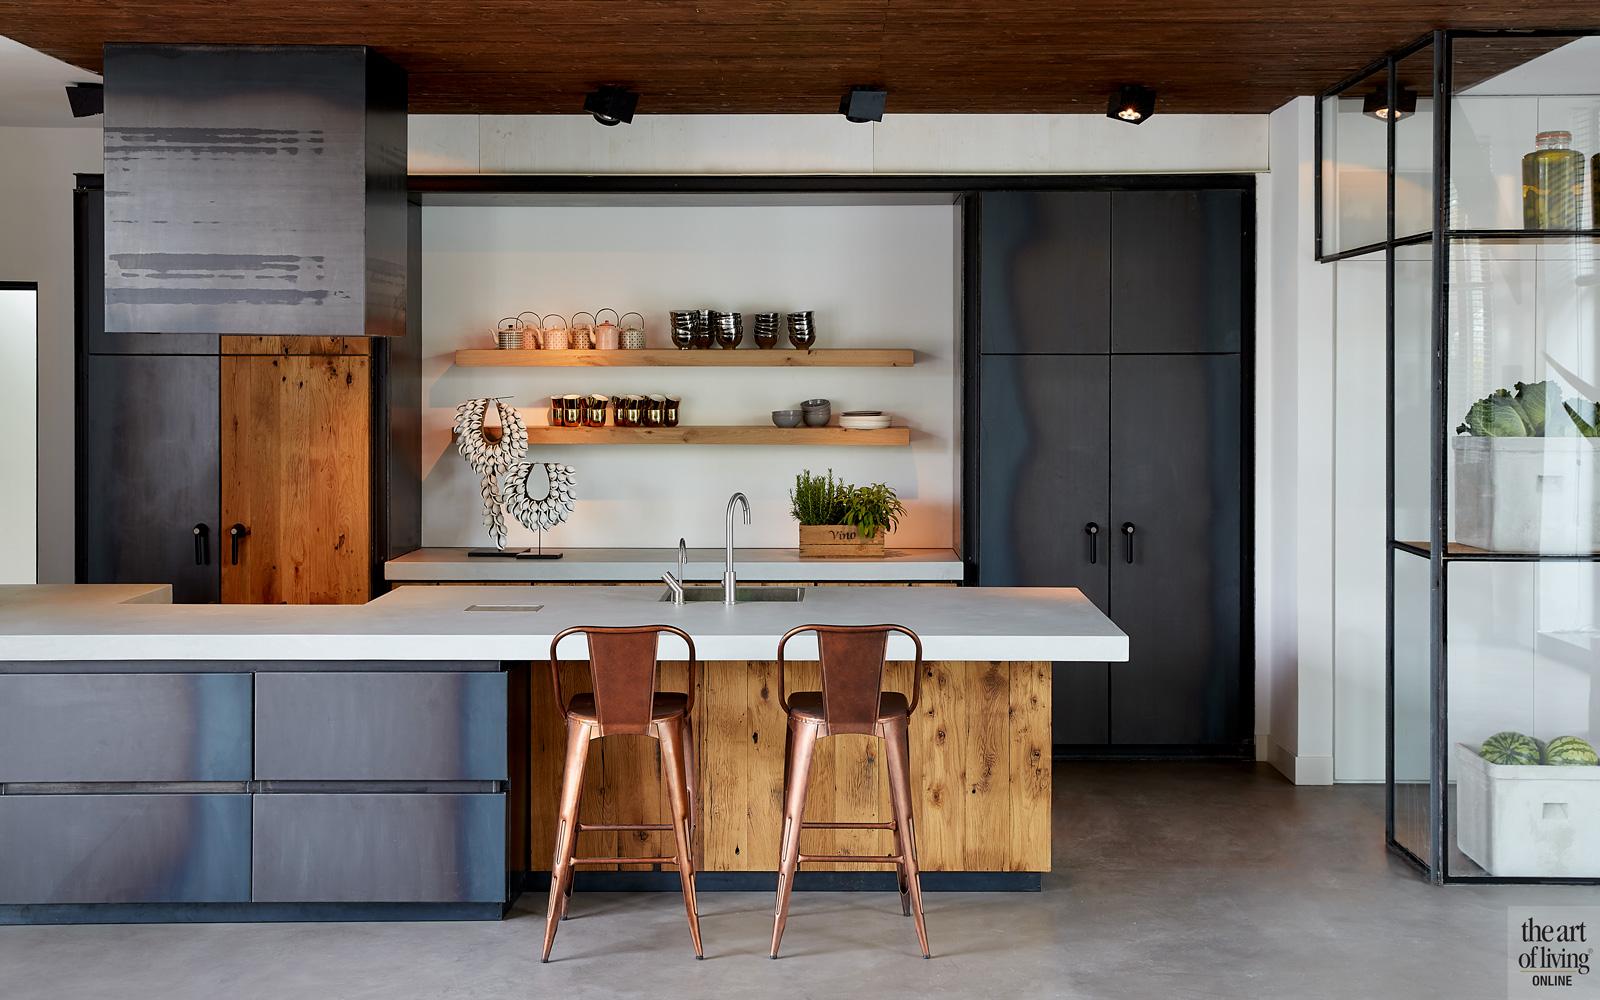 Keuken, privé keuken, industriële look, hout, gietvloer, woning in kerk, Osiris Hertman